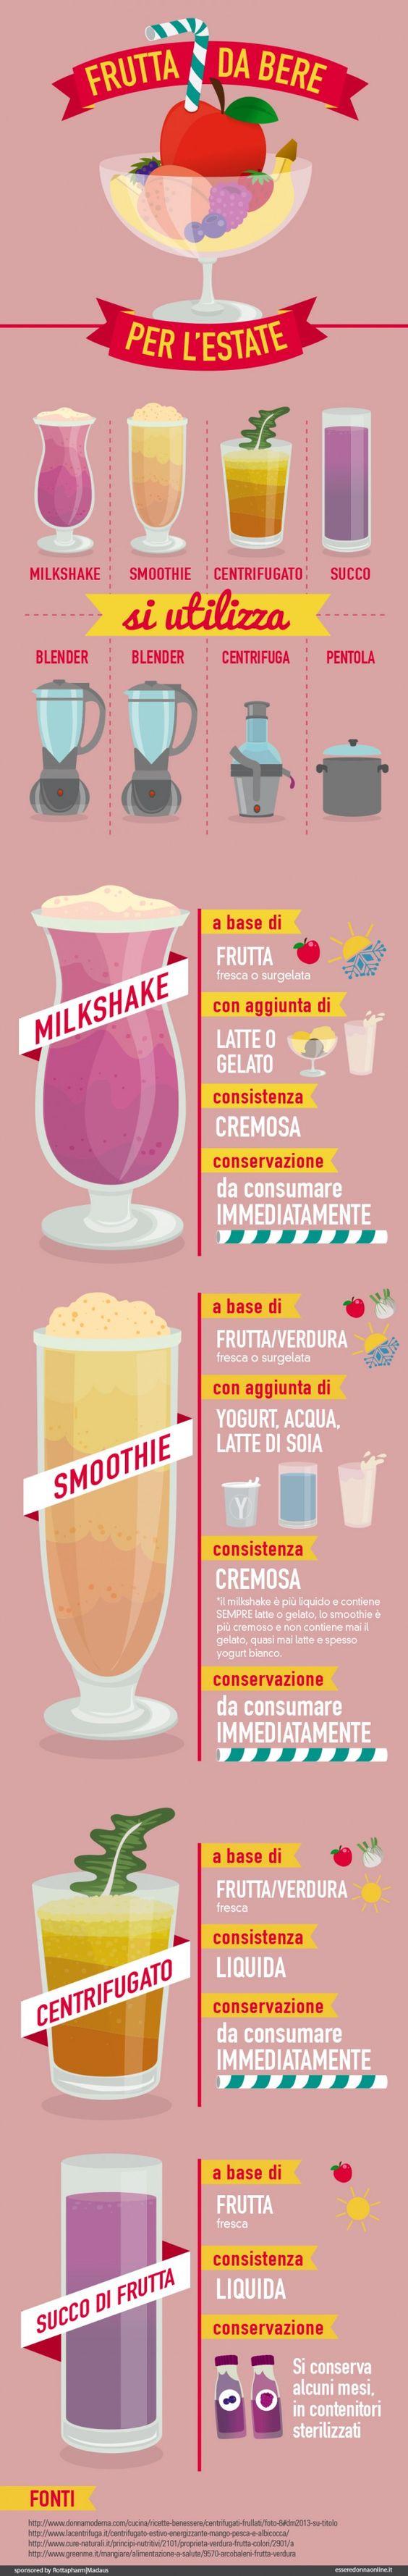 infographic: Frutta da bere per l'estate-Fruit drink for the summer for Esseredonnaonline.com by Kleland studio of Alice Kle Borghi